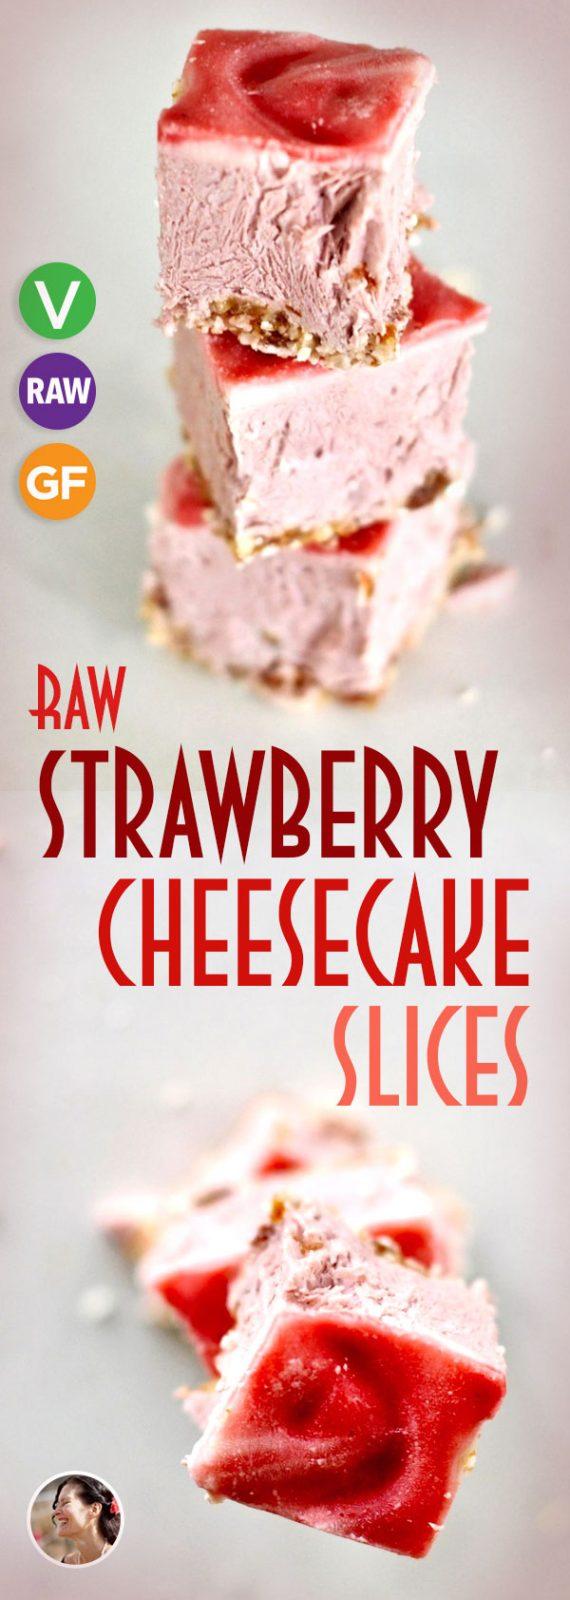 Vegan Strawberry Cheesecake Slices